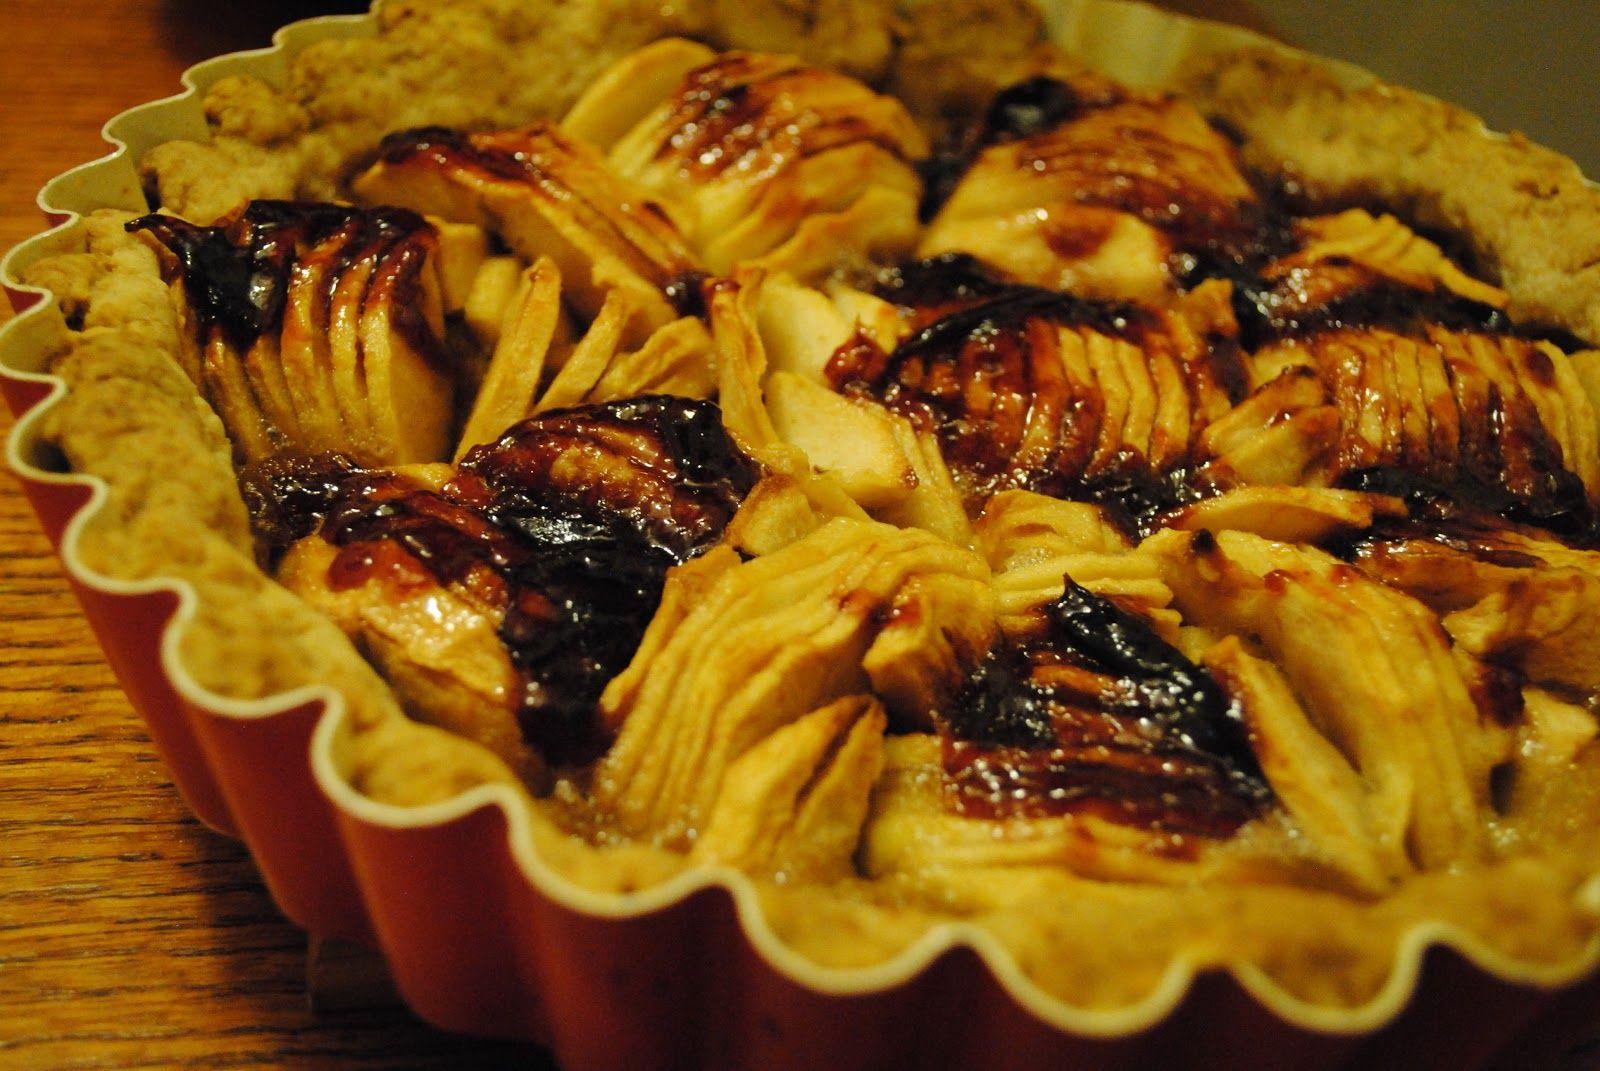 Culinary Adventures with Camilla: Pumpkin Butter-Apple Tart with a Plum Glaze